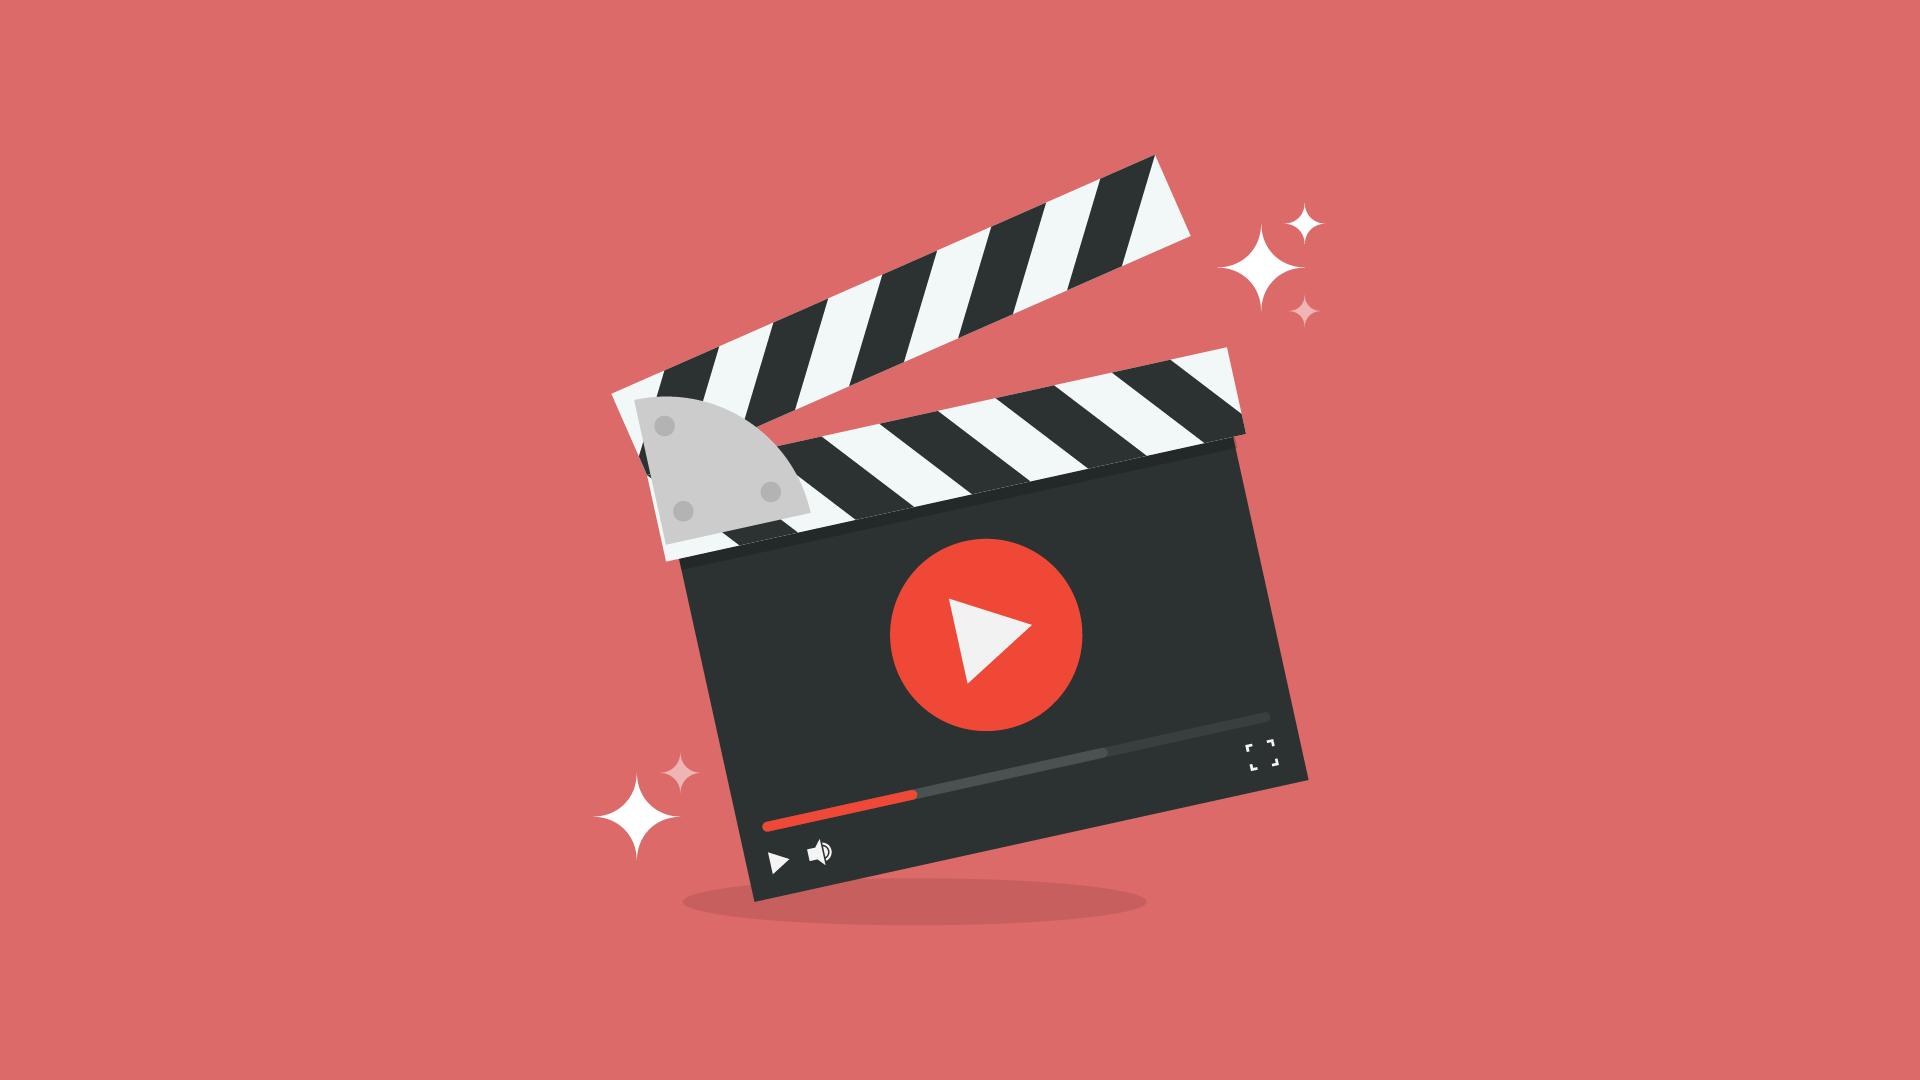 Subtitles iMovie: How to add subtitles and captions to iMovie?